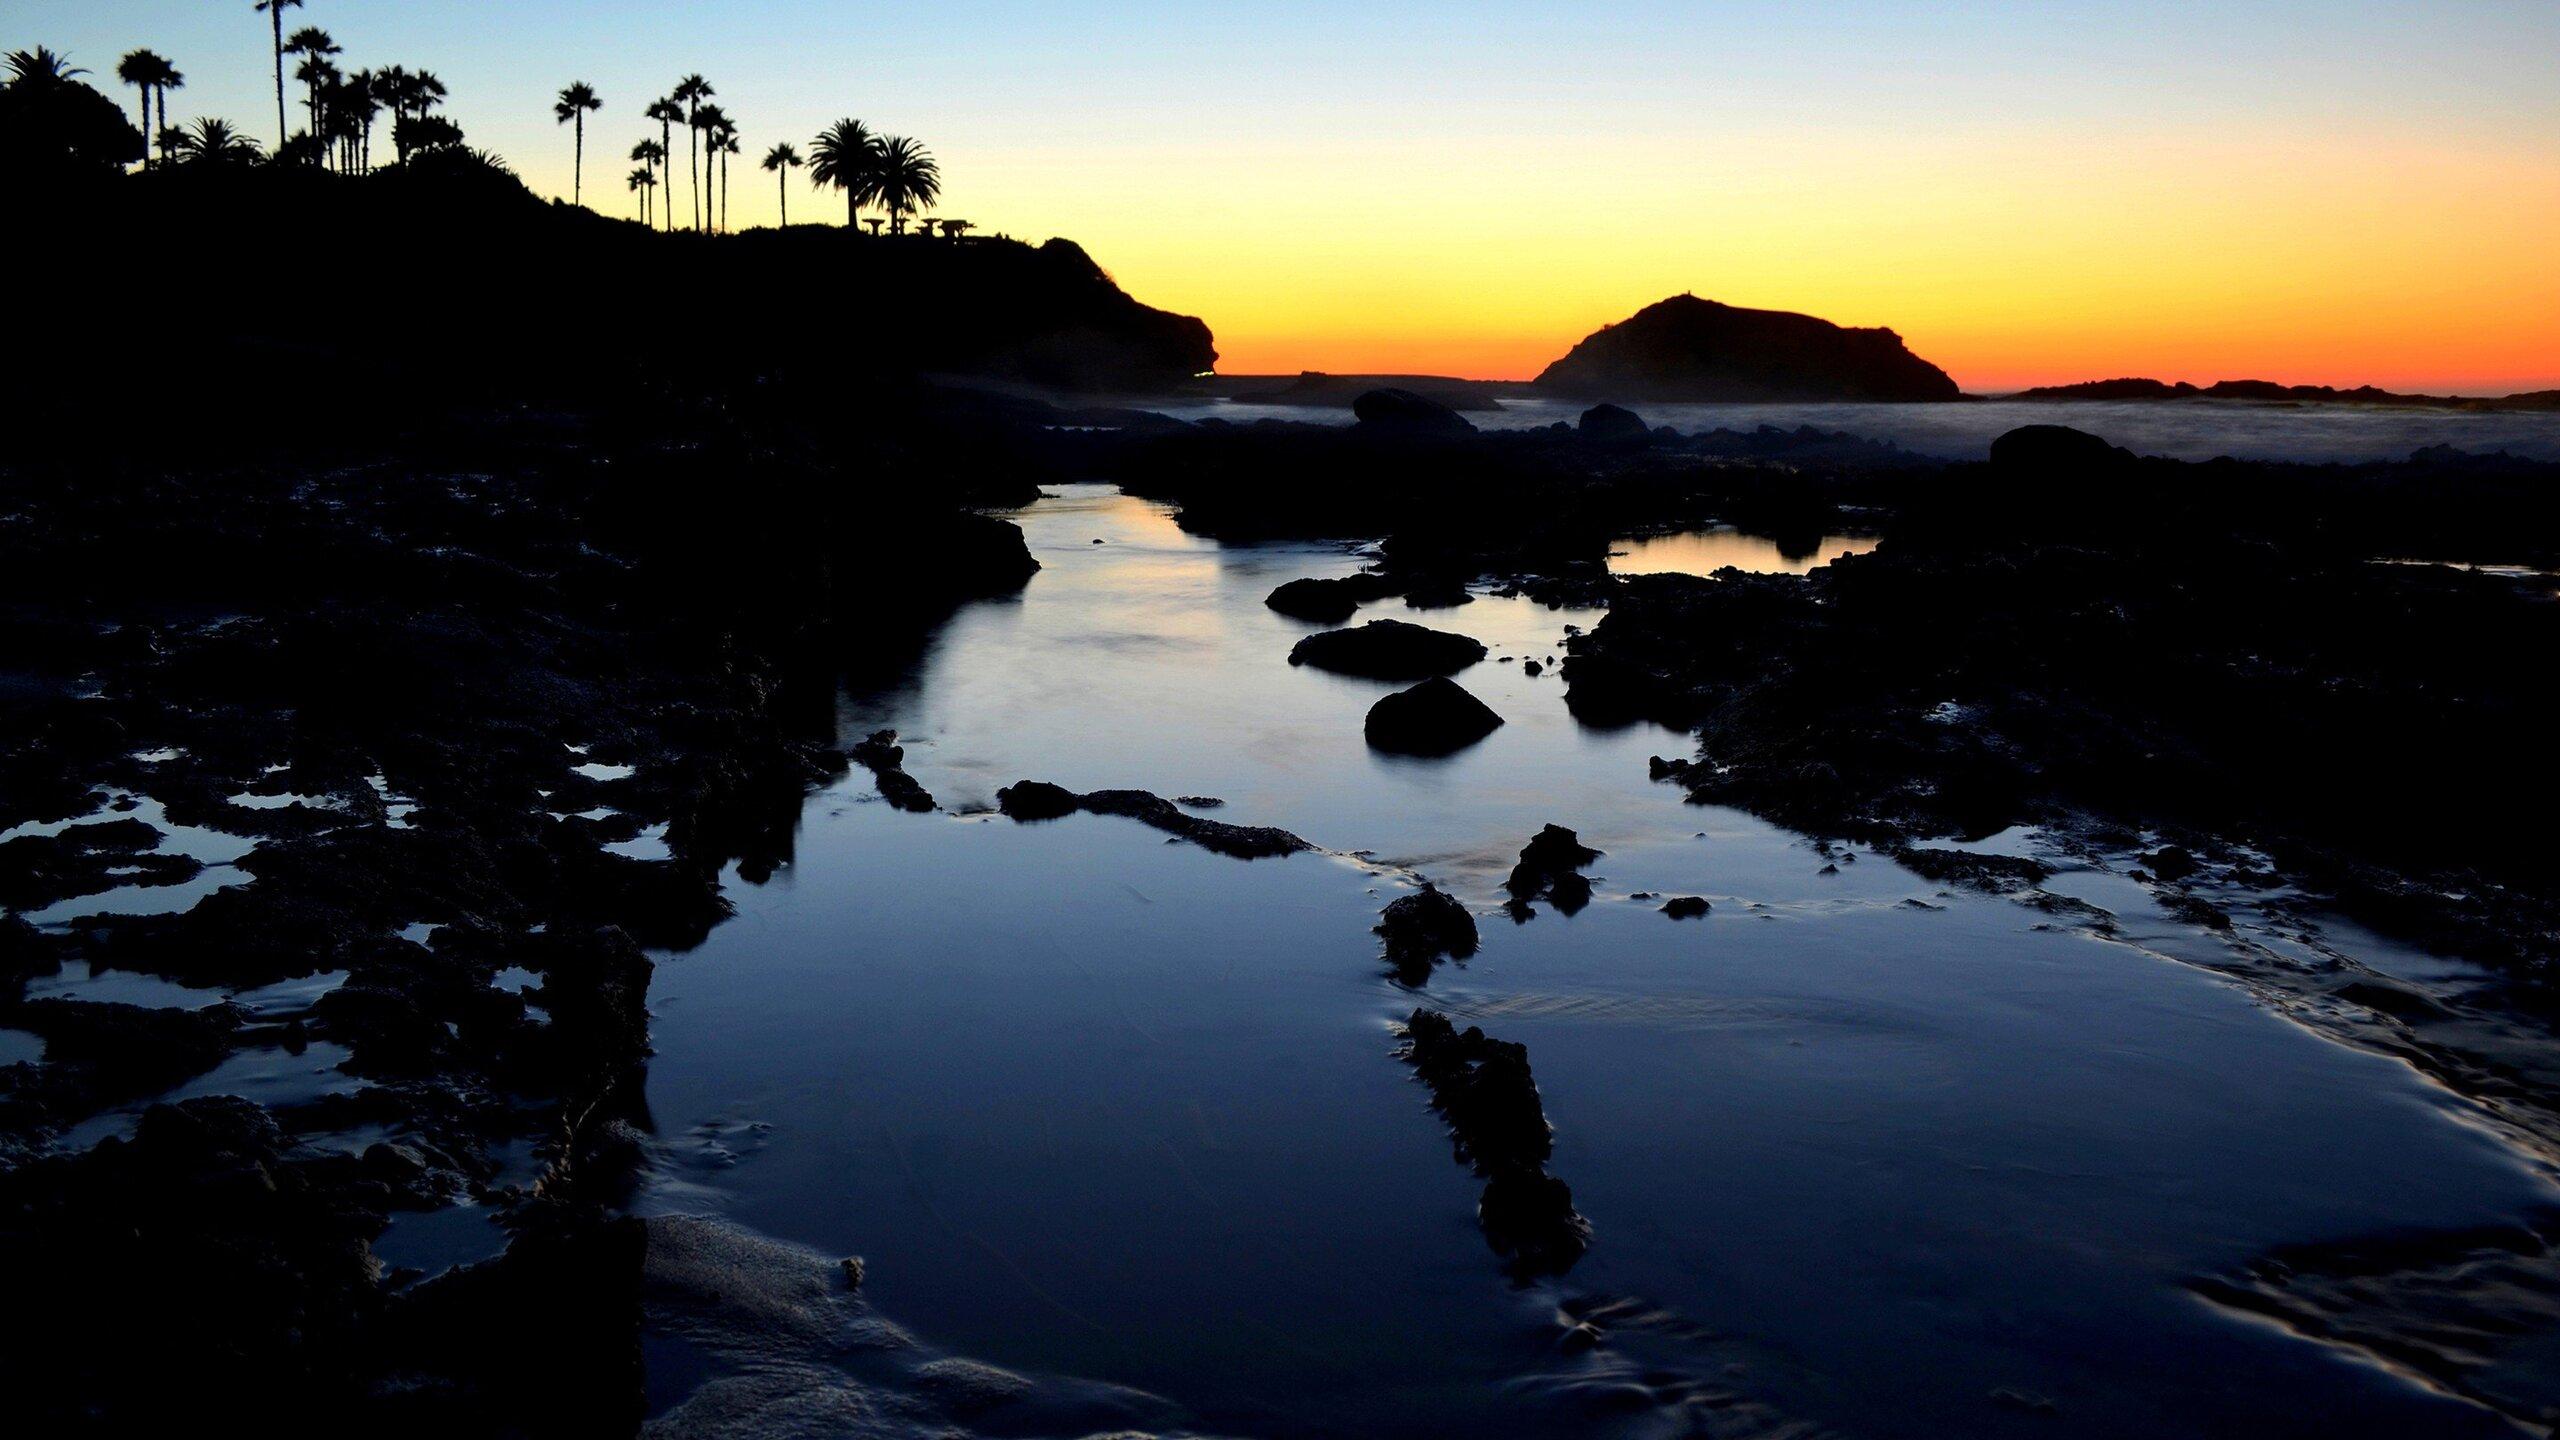 laguna-beach-sunset.jpg